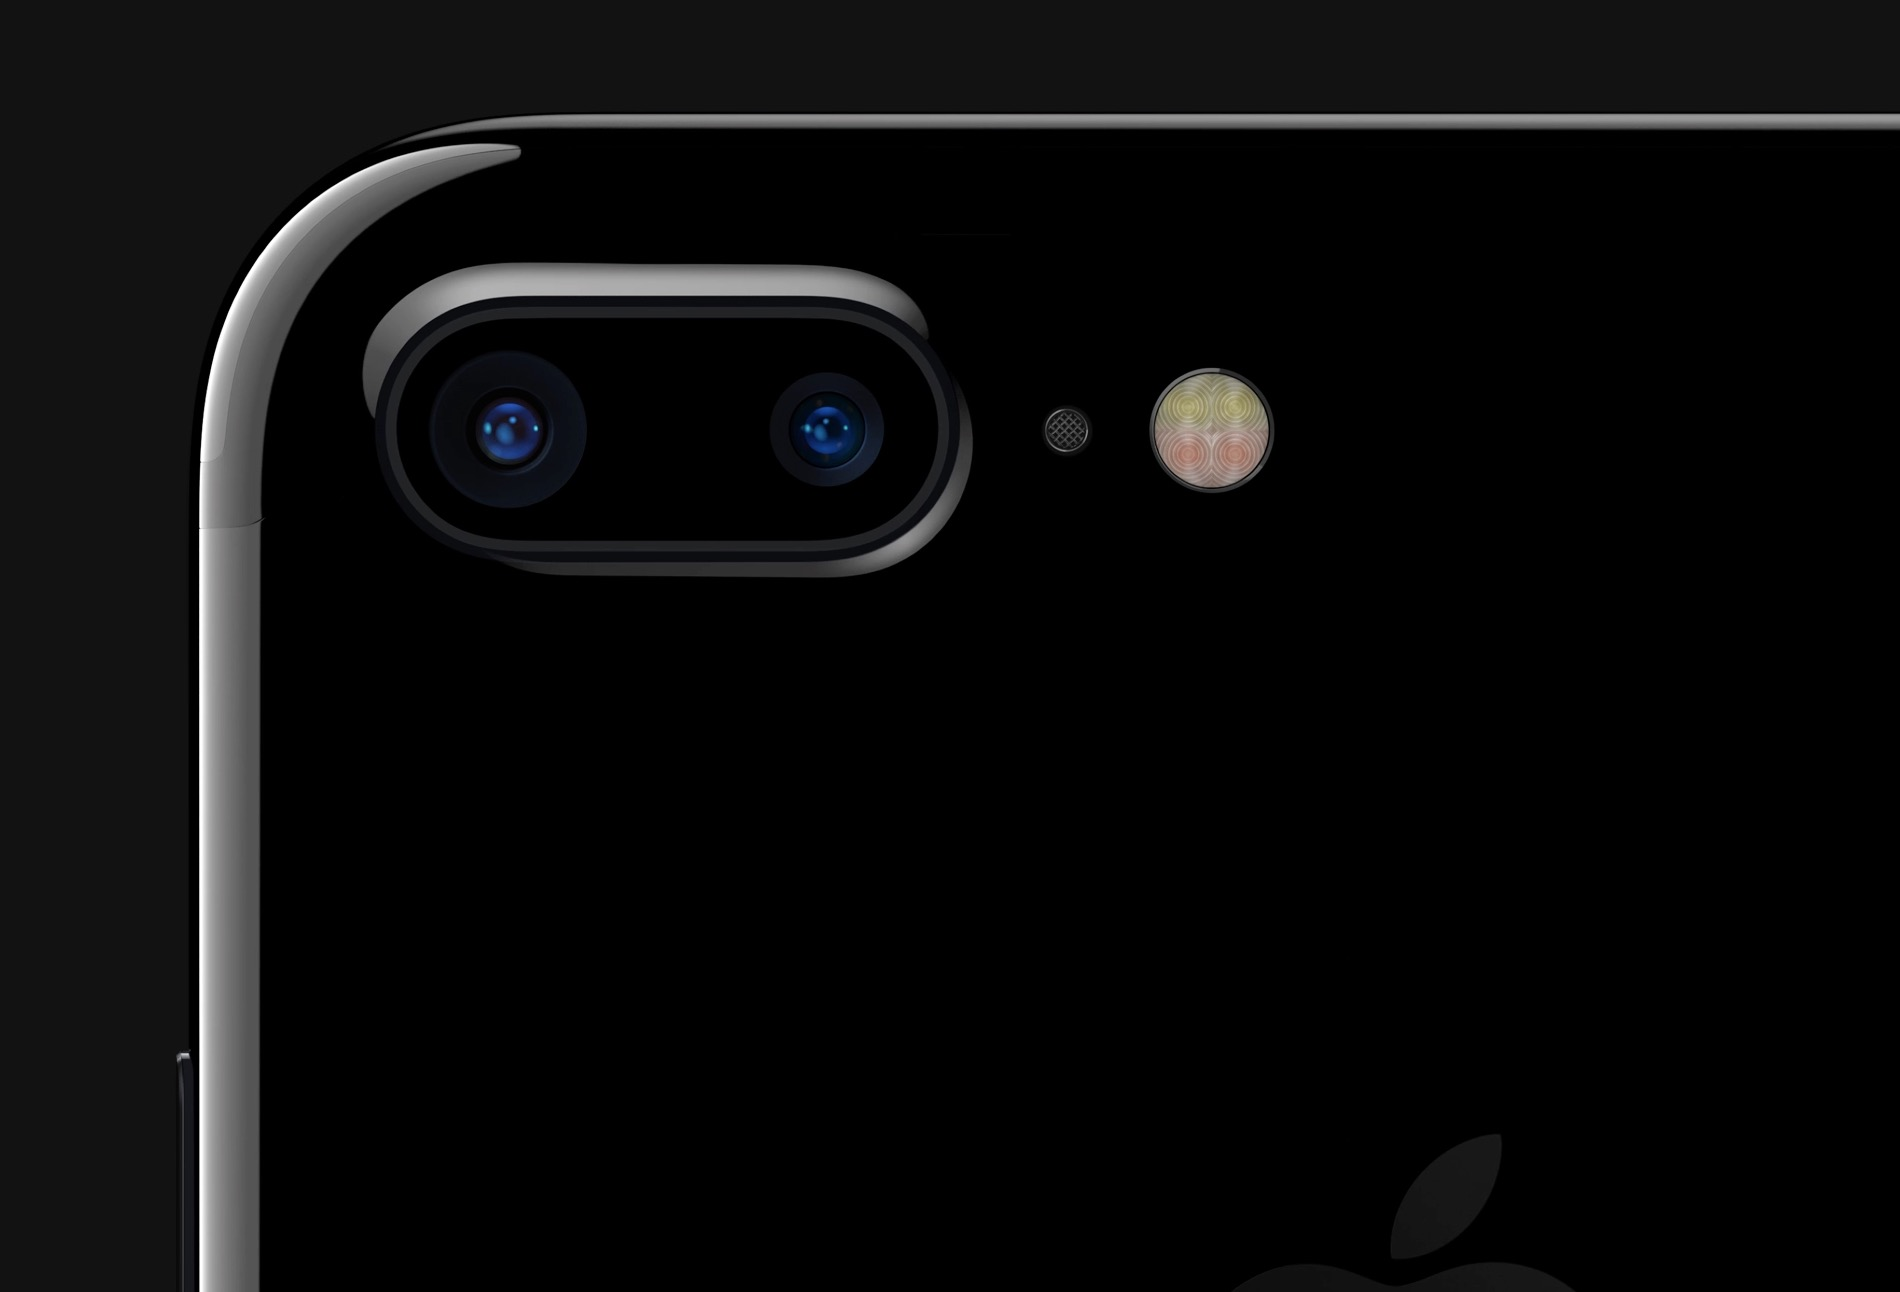 iPhone 7 Plus fotocamera doppia retro